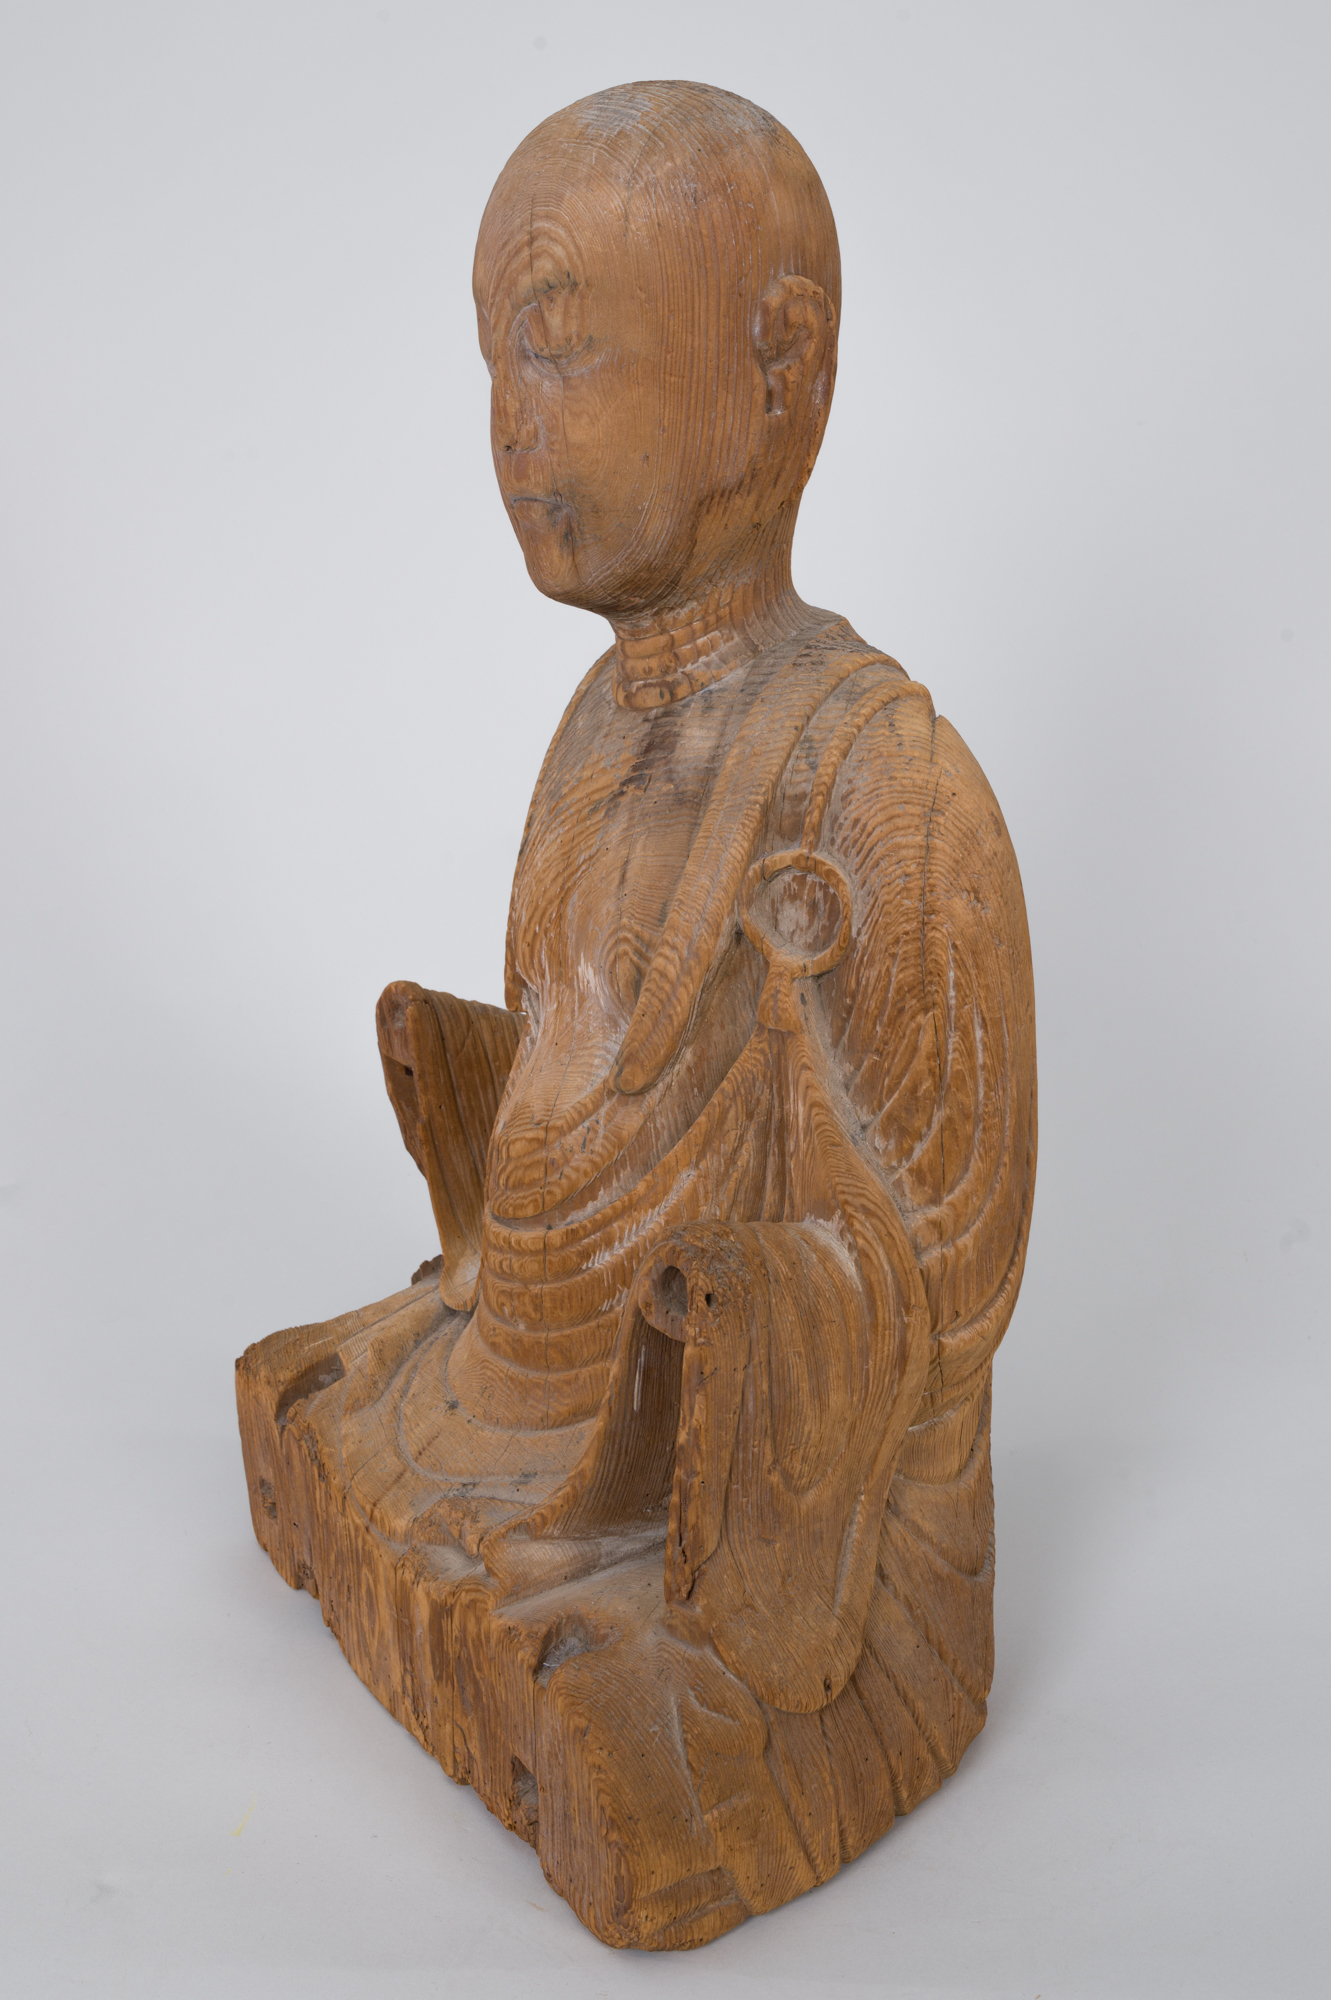 Japanese art, Japanese antique, buddhist sculpture, shinto sculpture, heian art, antique sculpture, Japanese sculpture, Japanese buddha